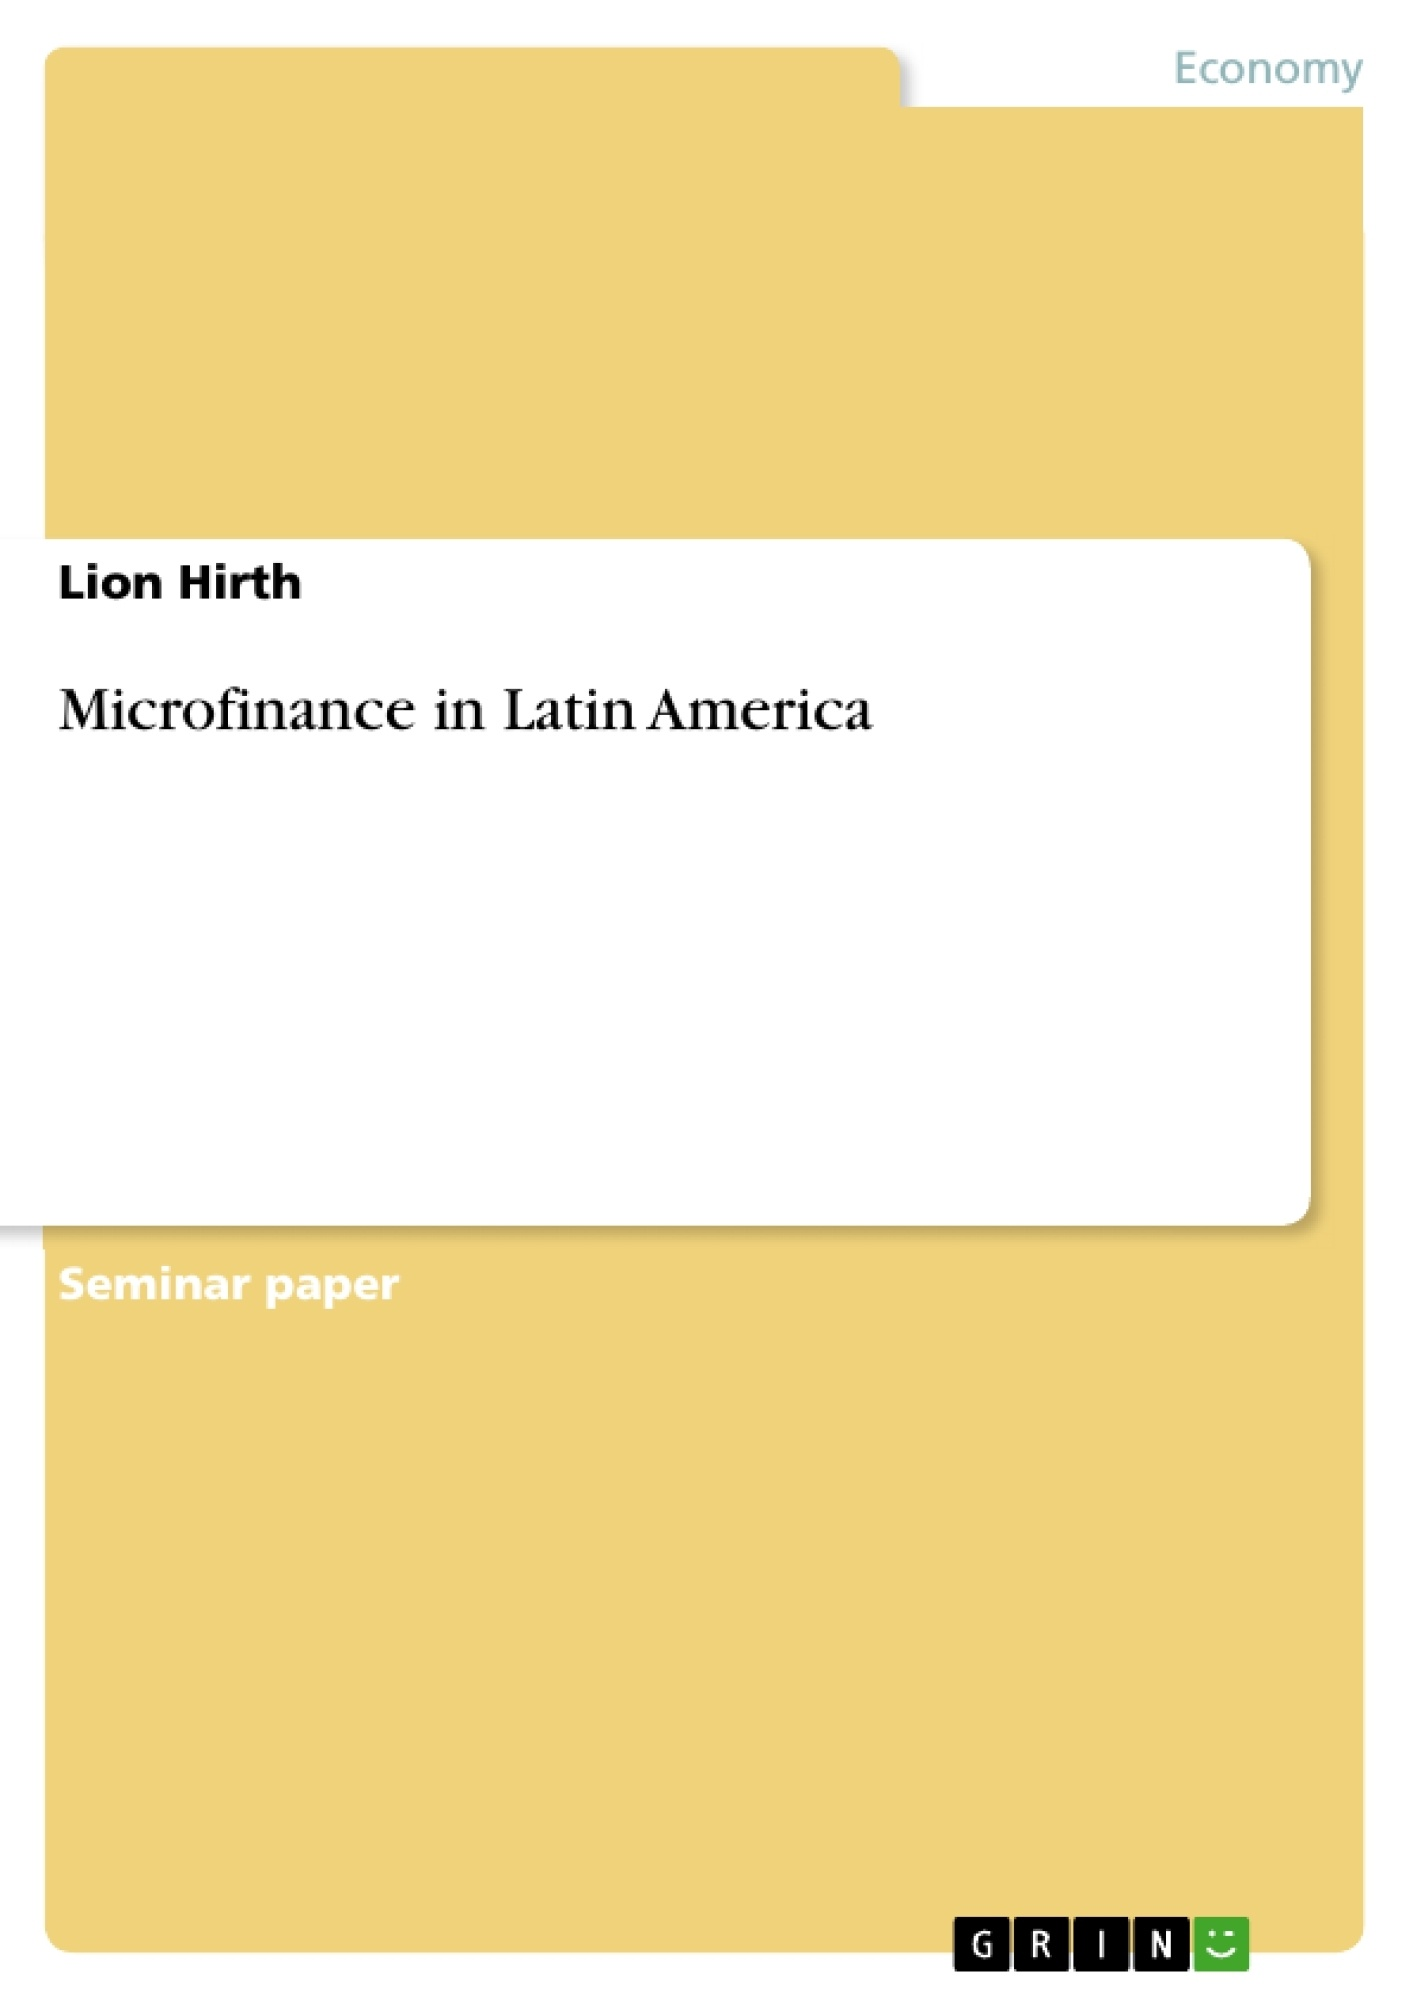 Title: Microfinance in Latin America